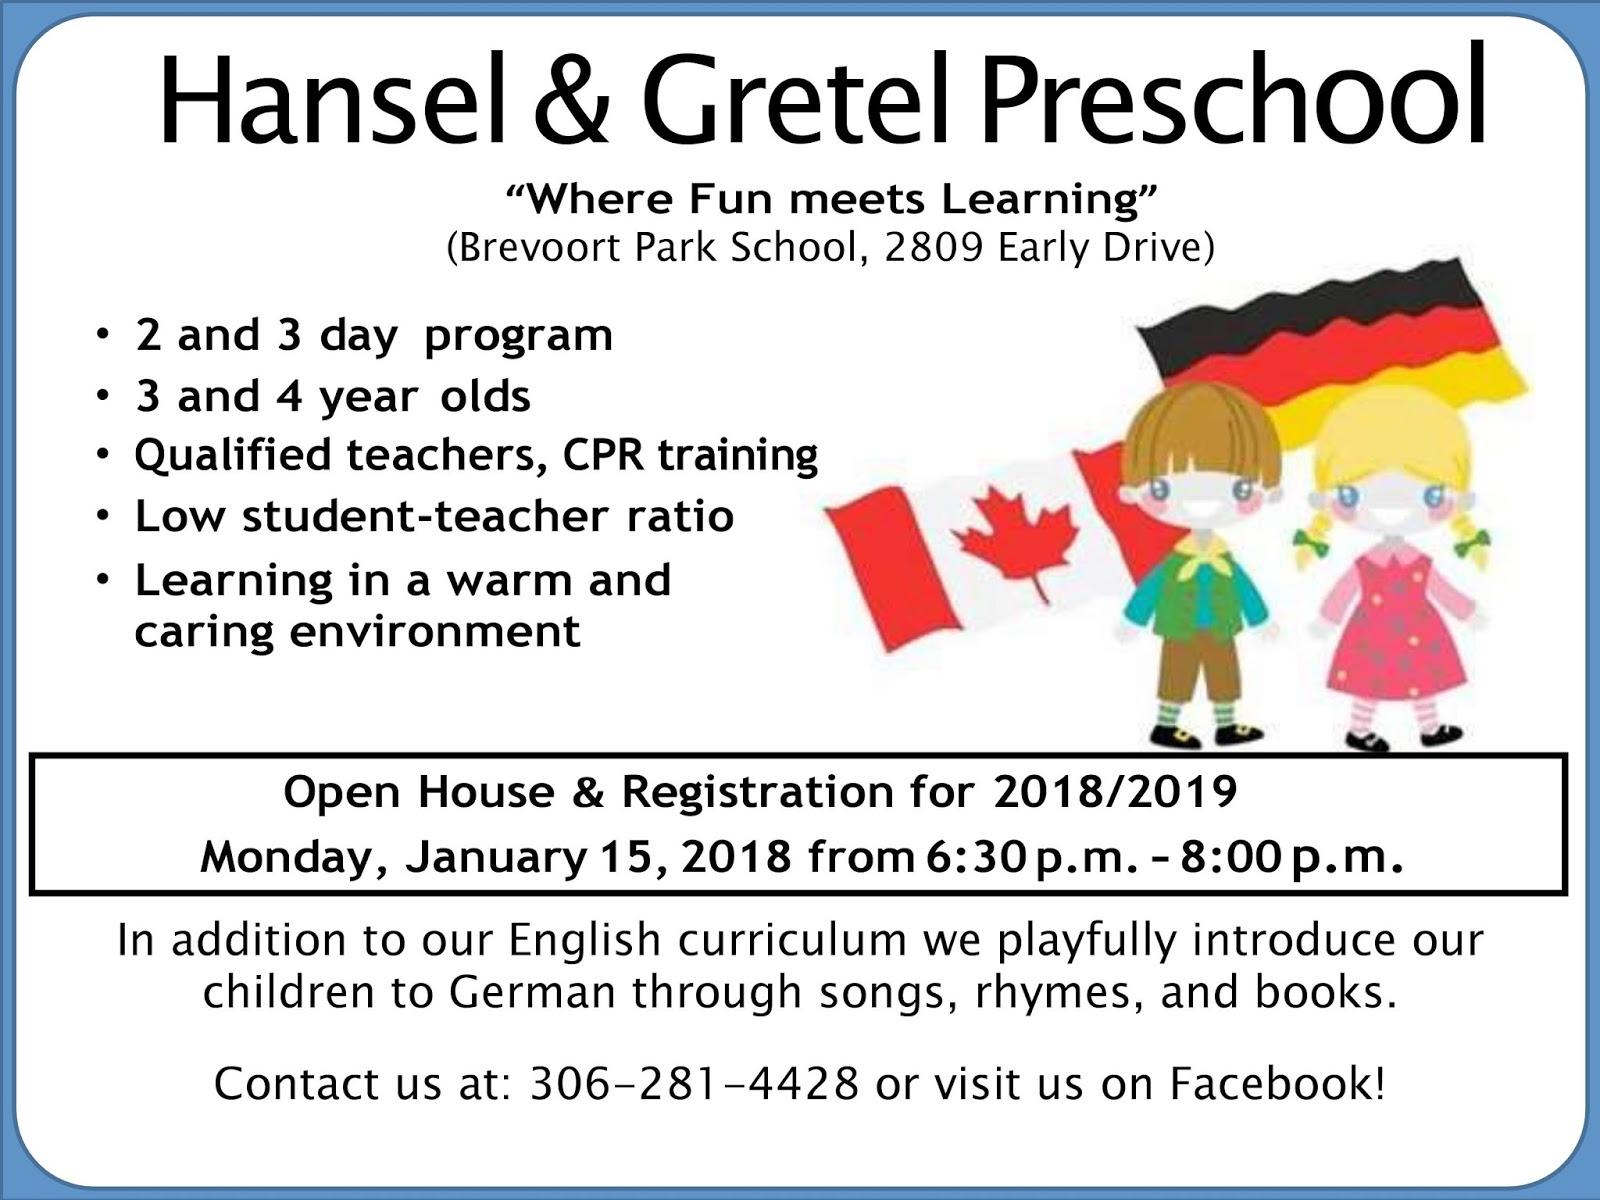 Hansel And Gretel Preschool Inc